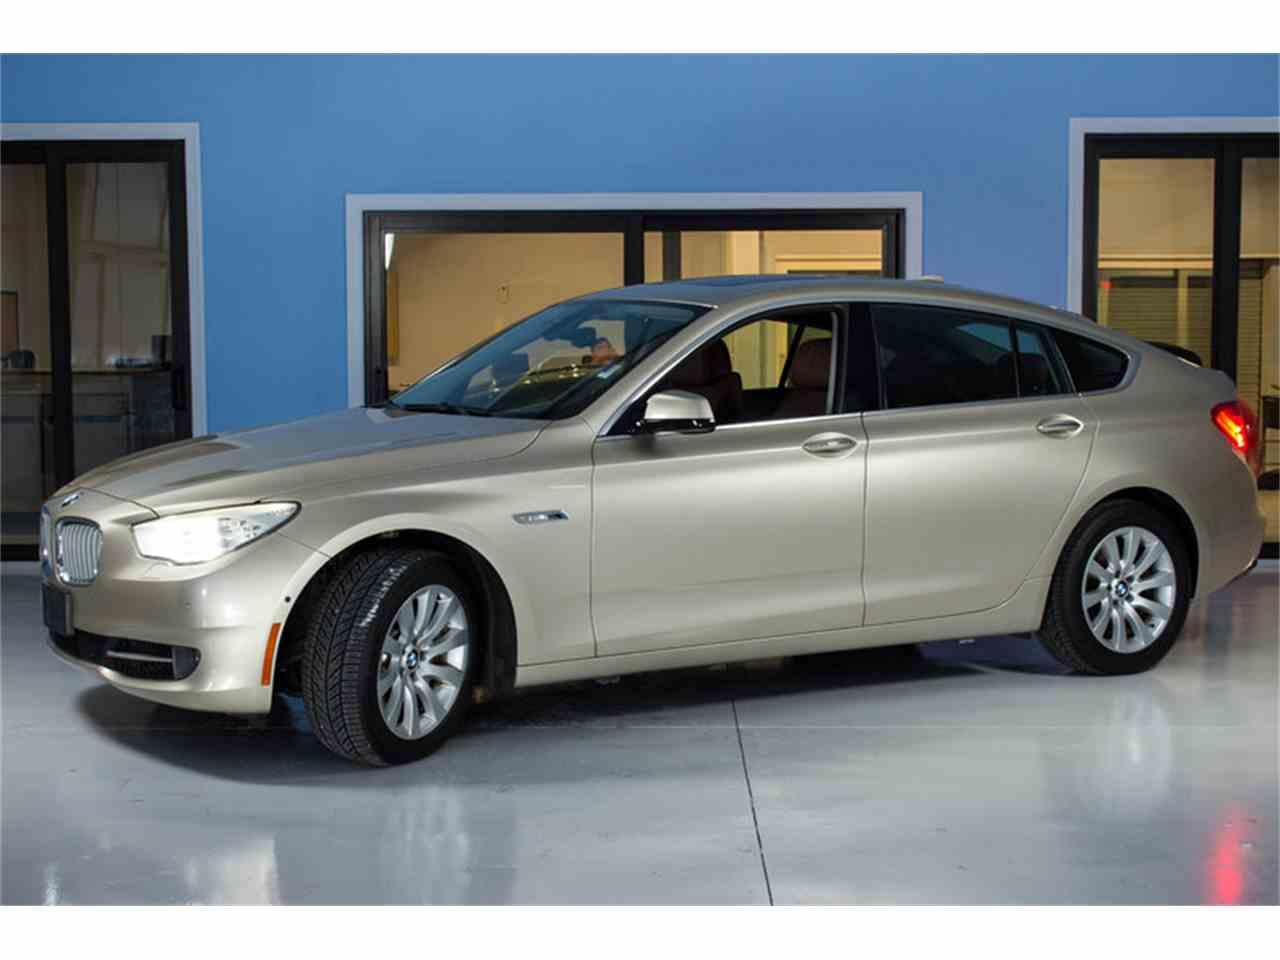 BMW I GT For Sale ClassicCarscom CC - 2010 bmw 550i gt for sale